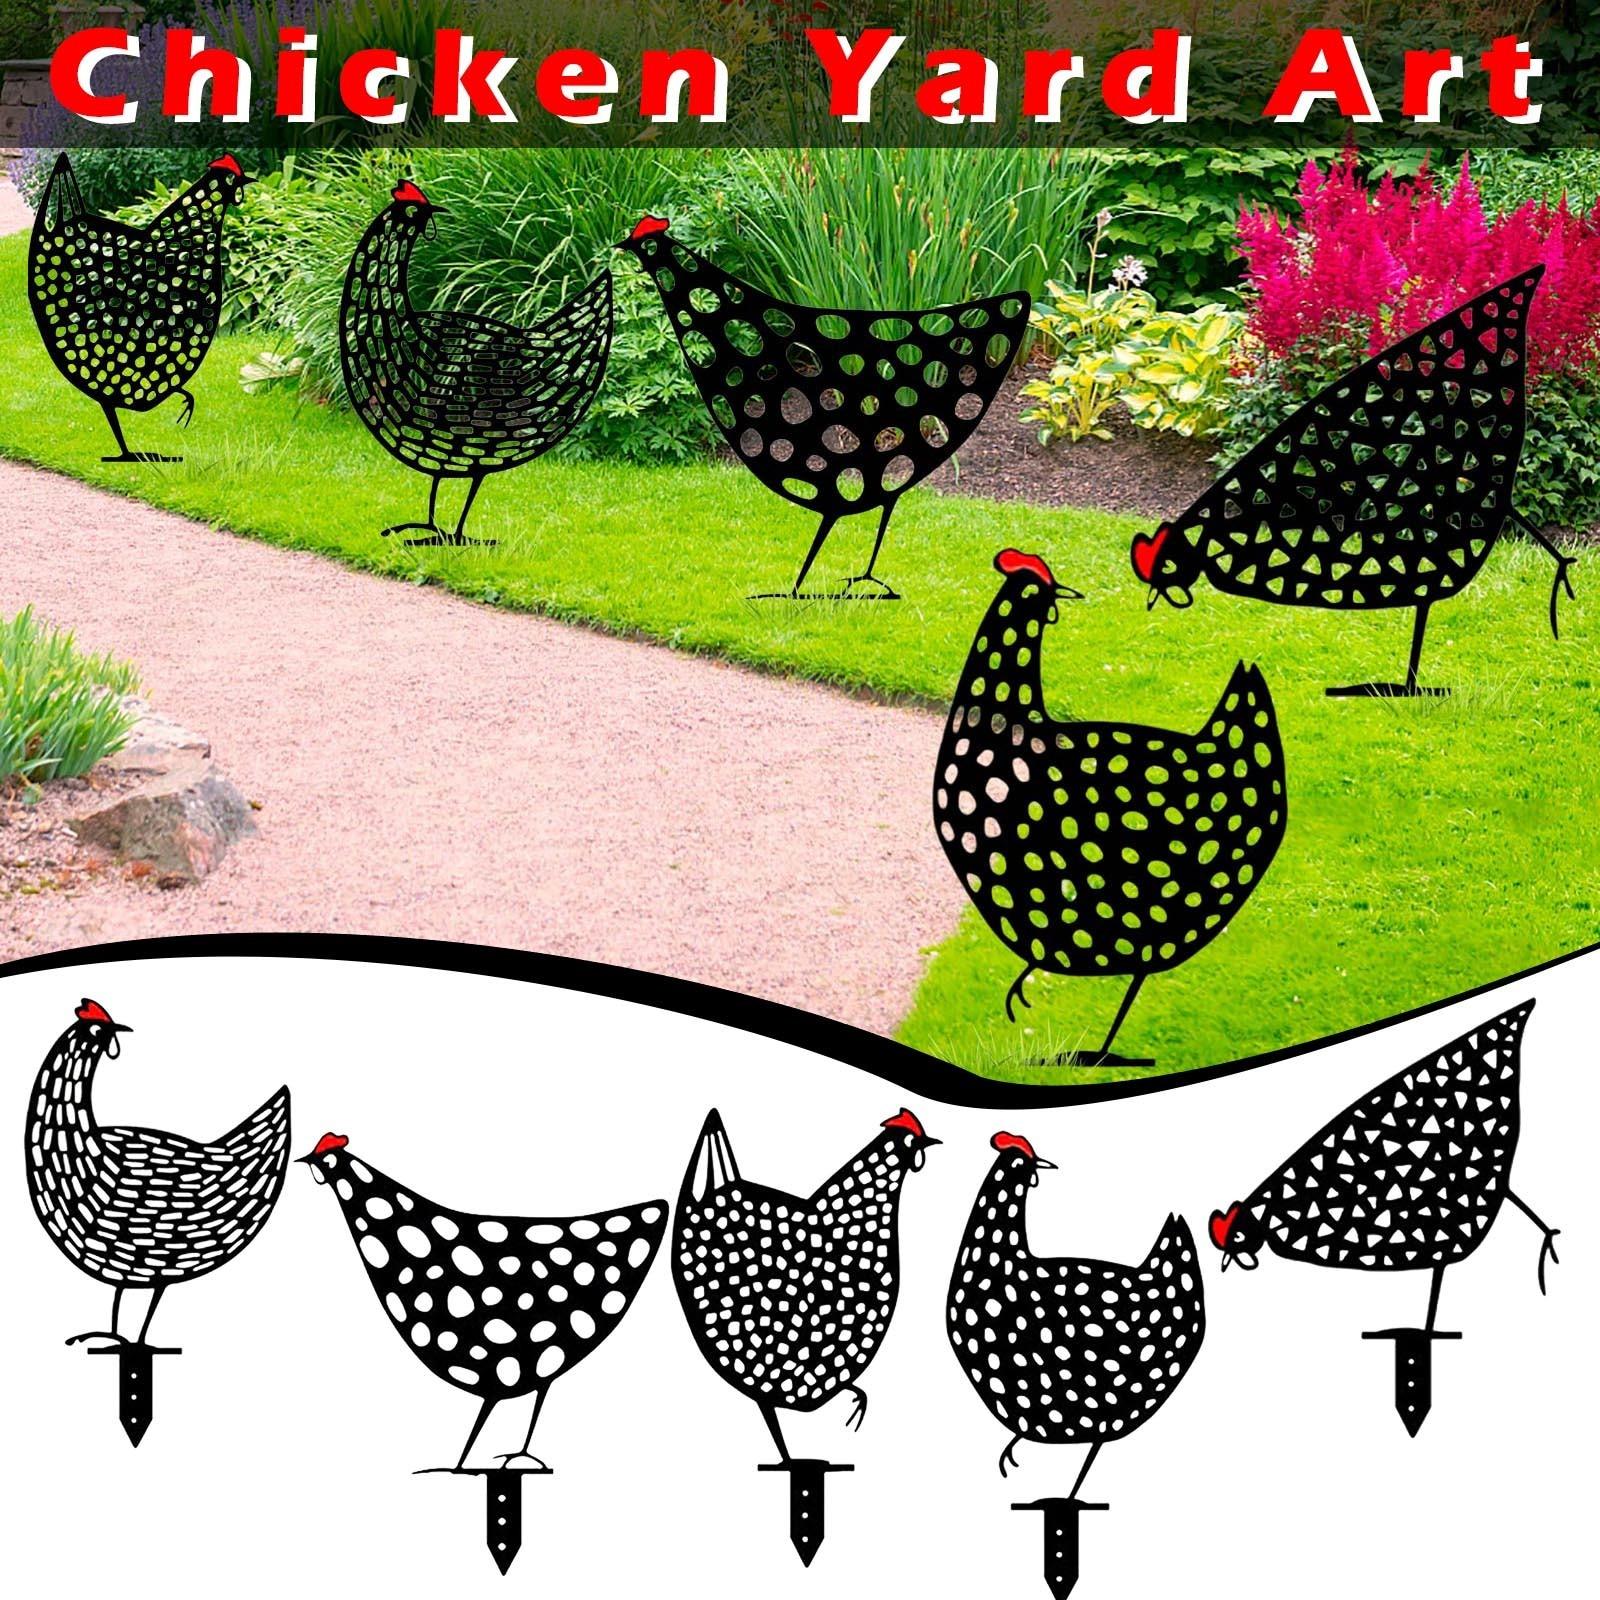 5Pcs Hen Yard Decor Easter Decoration Organizador Gardening Ornaments Chicken Yard Art Outdoor Garden Backyard Lawn Stakes Gift|Garden Statues & Sculptures| - AliExpress